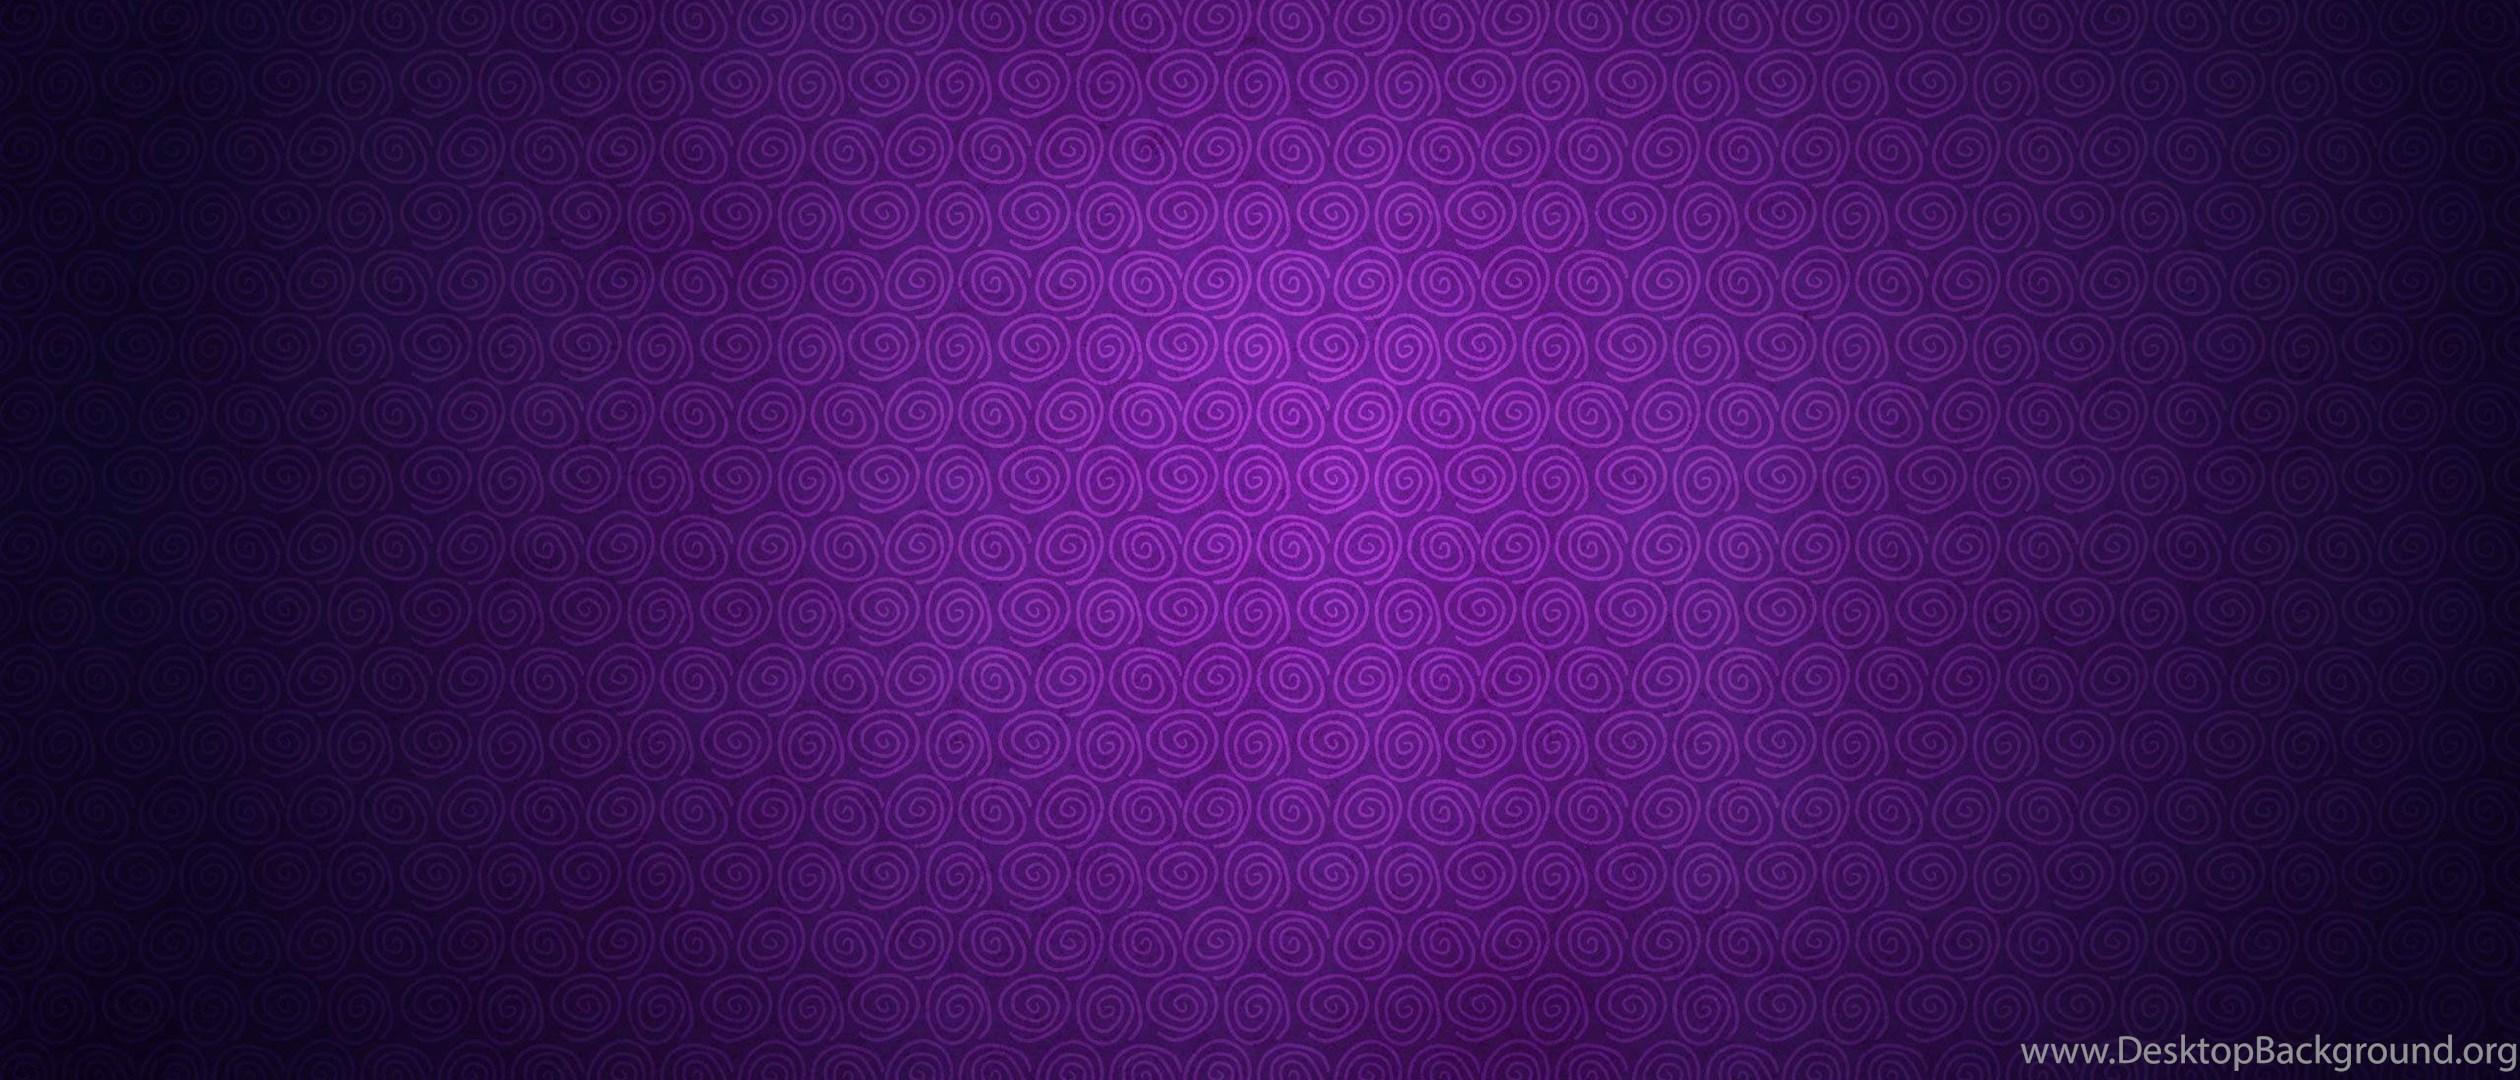 Plain Purple Wallpapers Wallpapers Zone Desktop Background